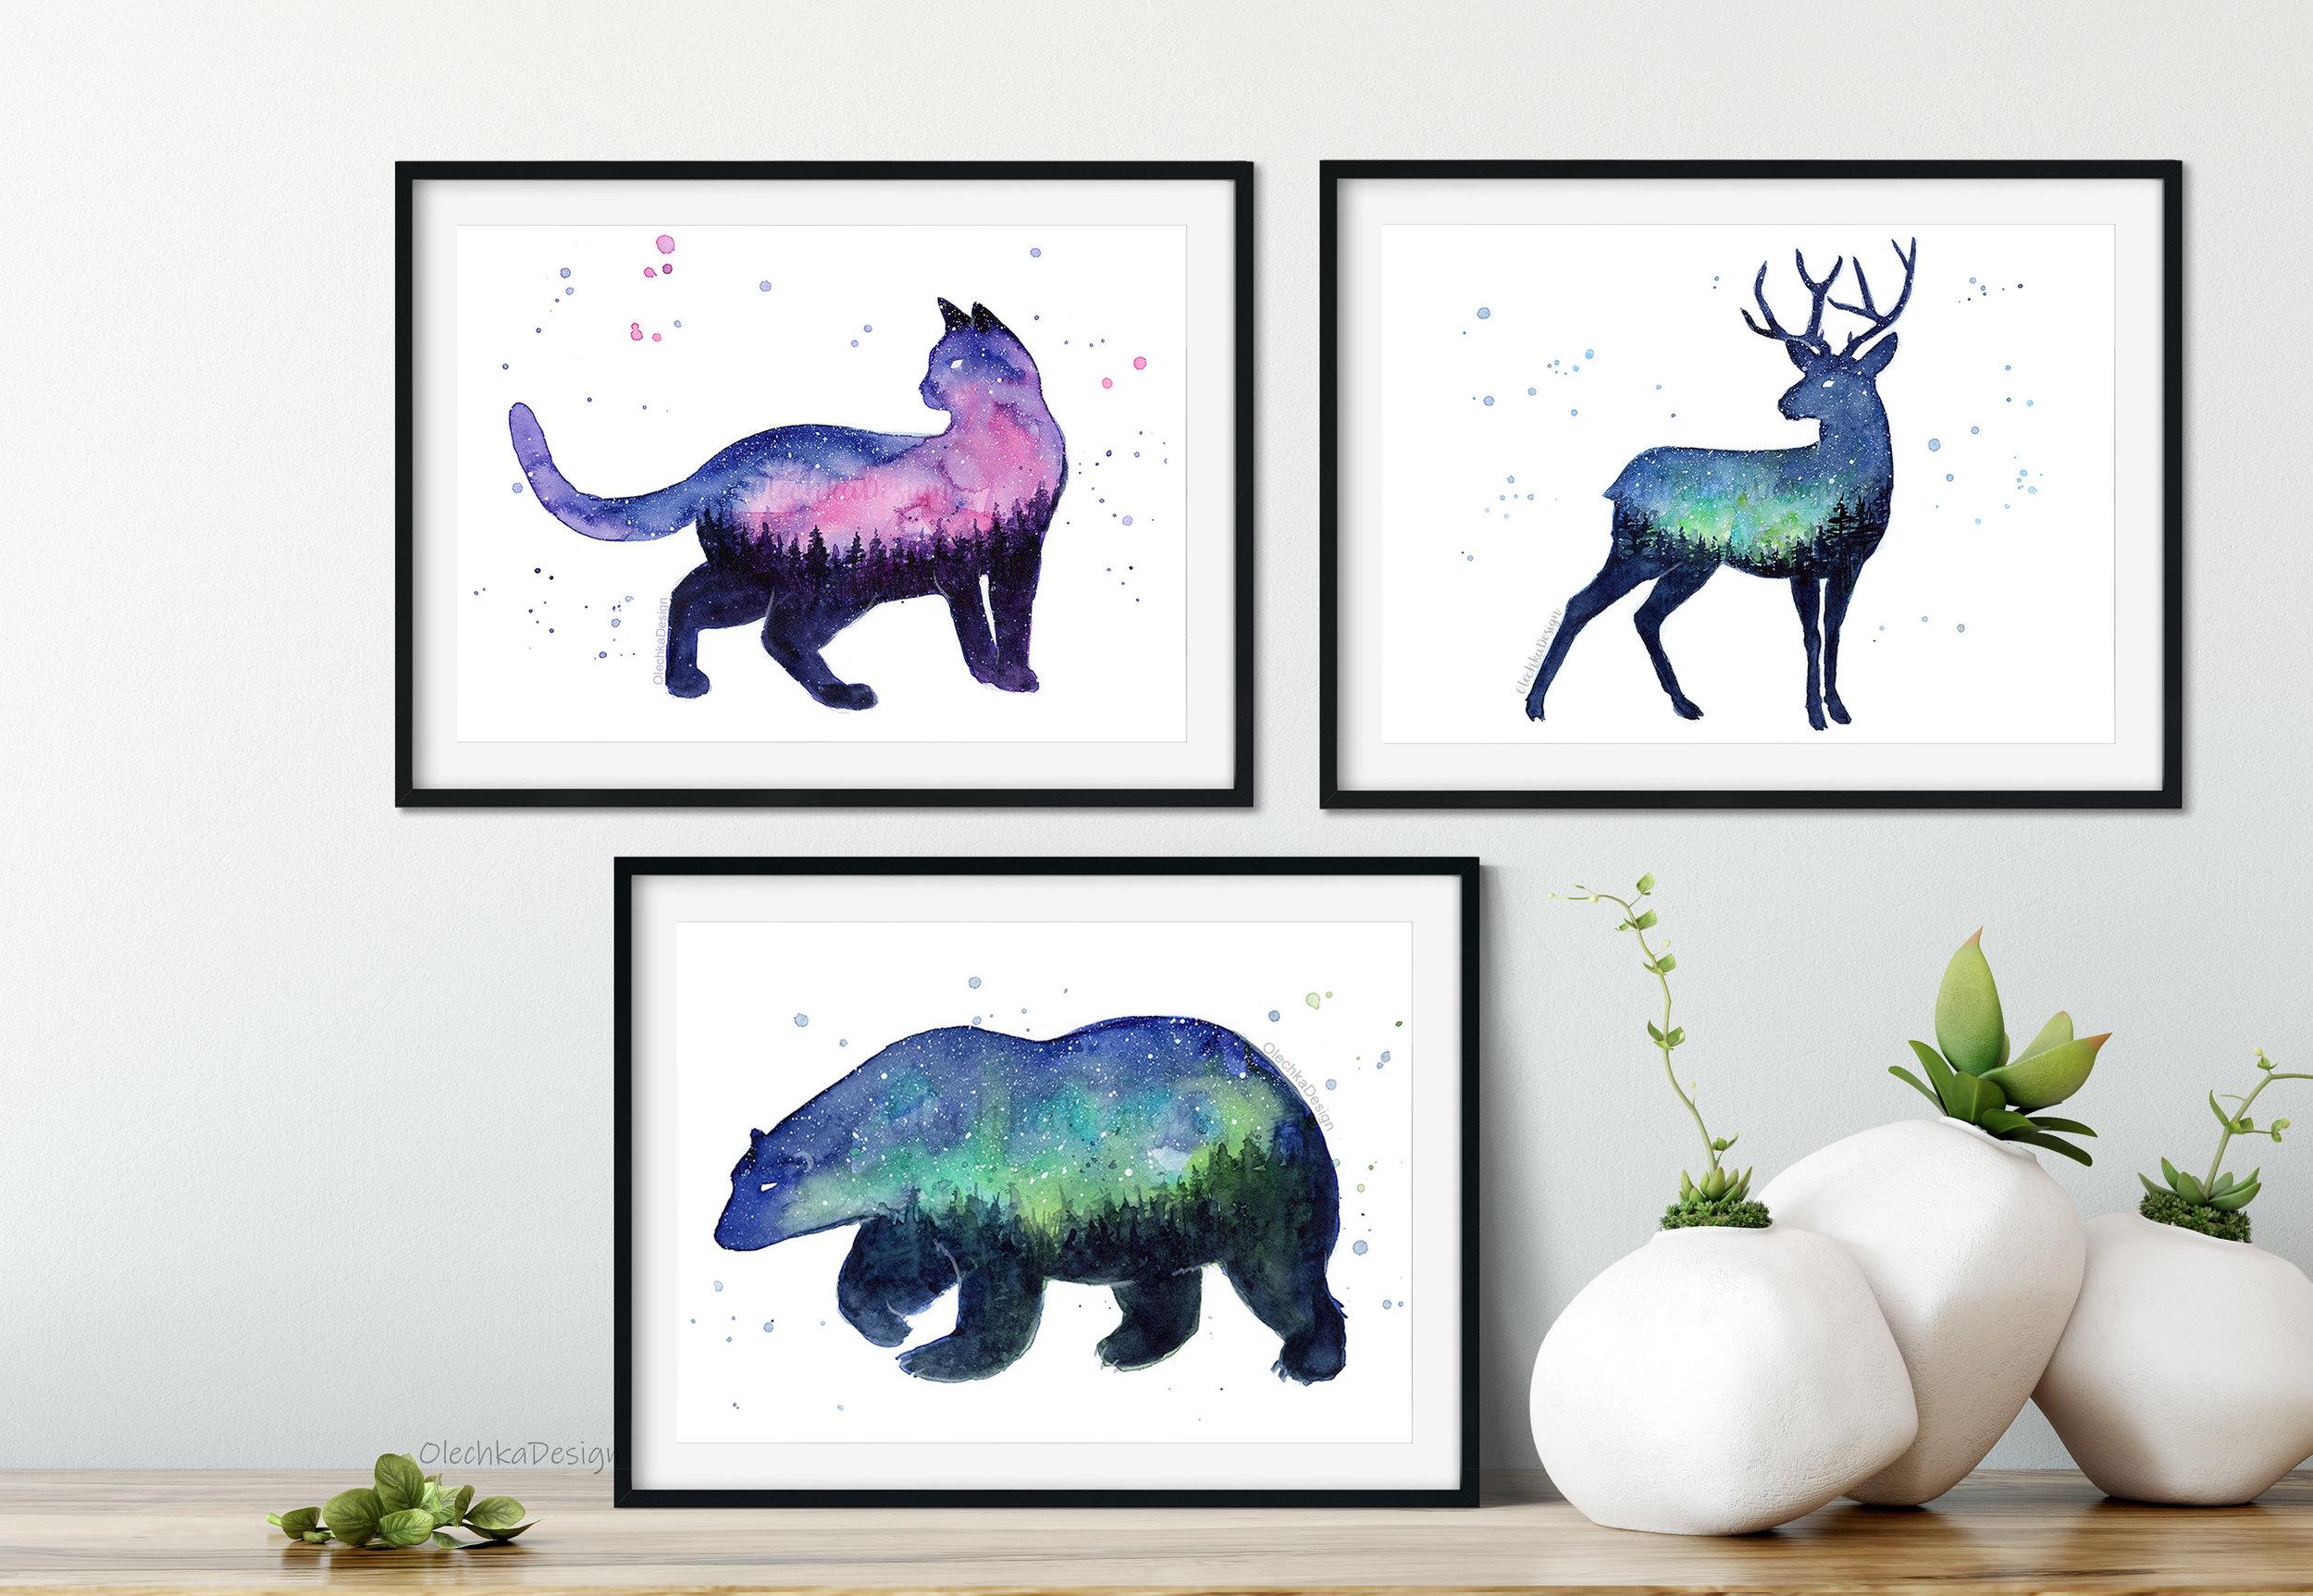 galaxy-animals-wall-art.jpg